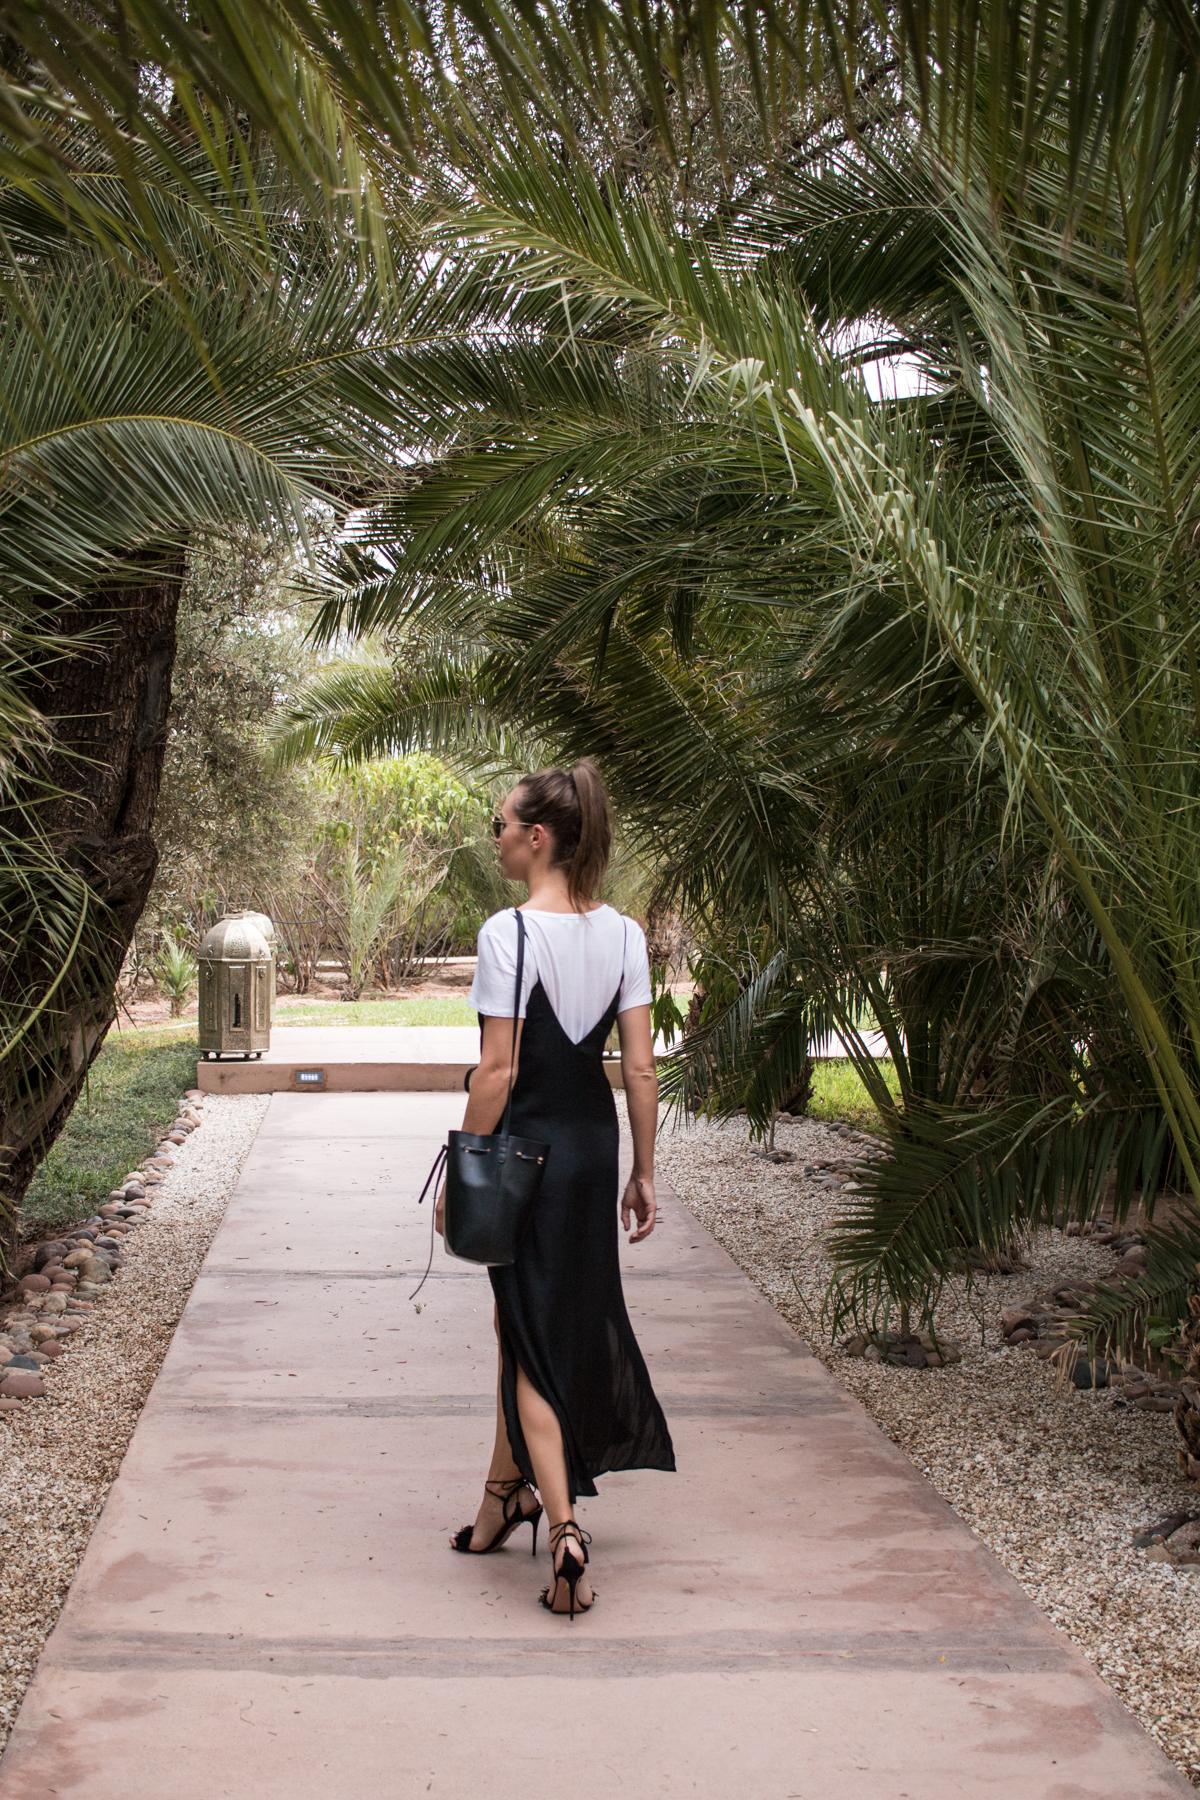 marrakech-travel-diary-191